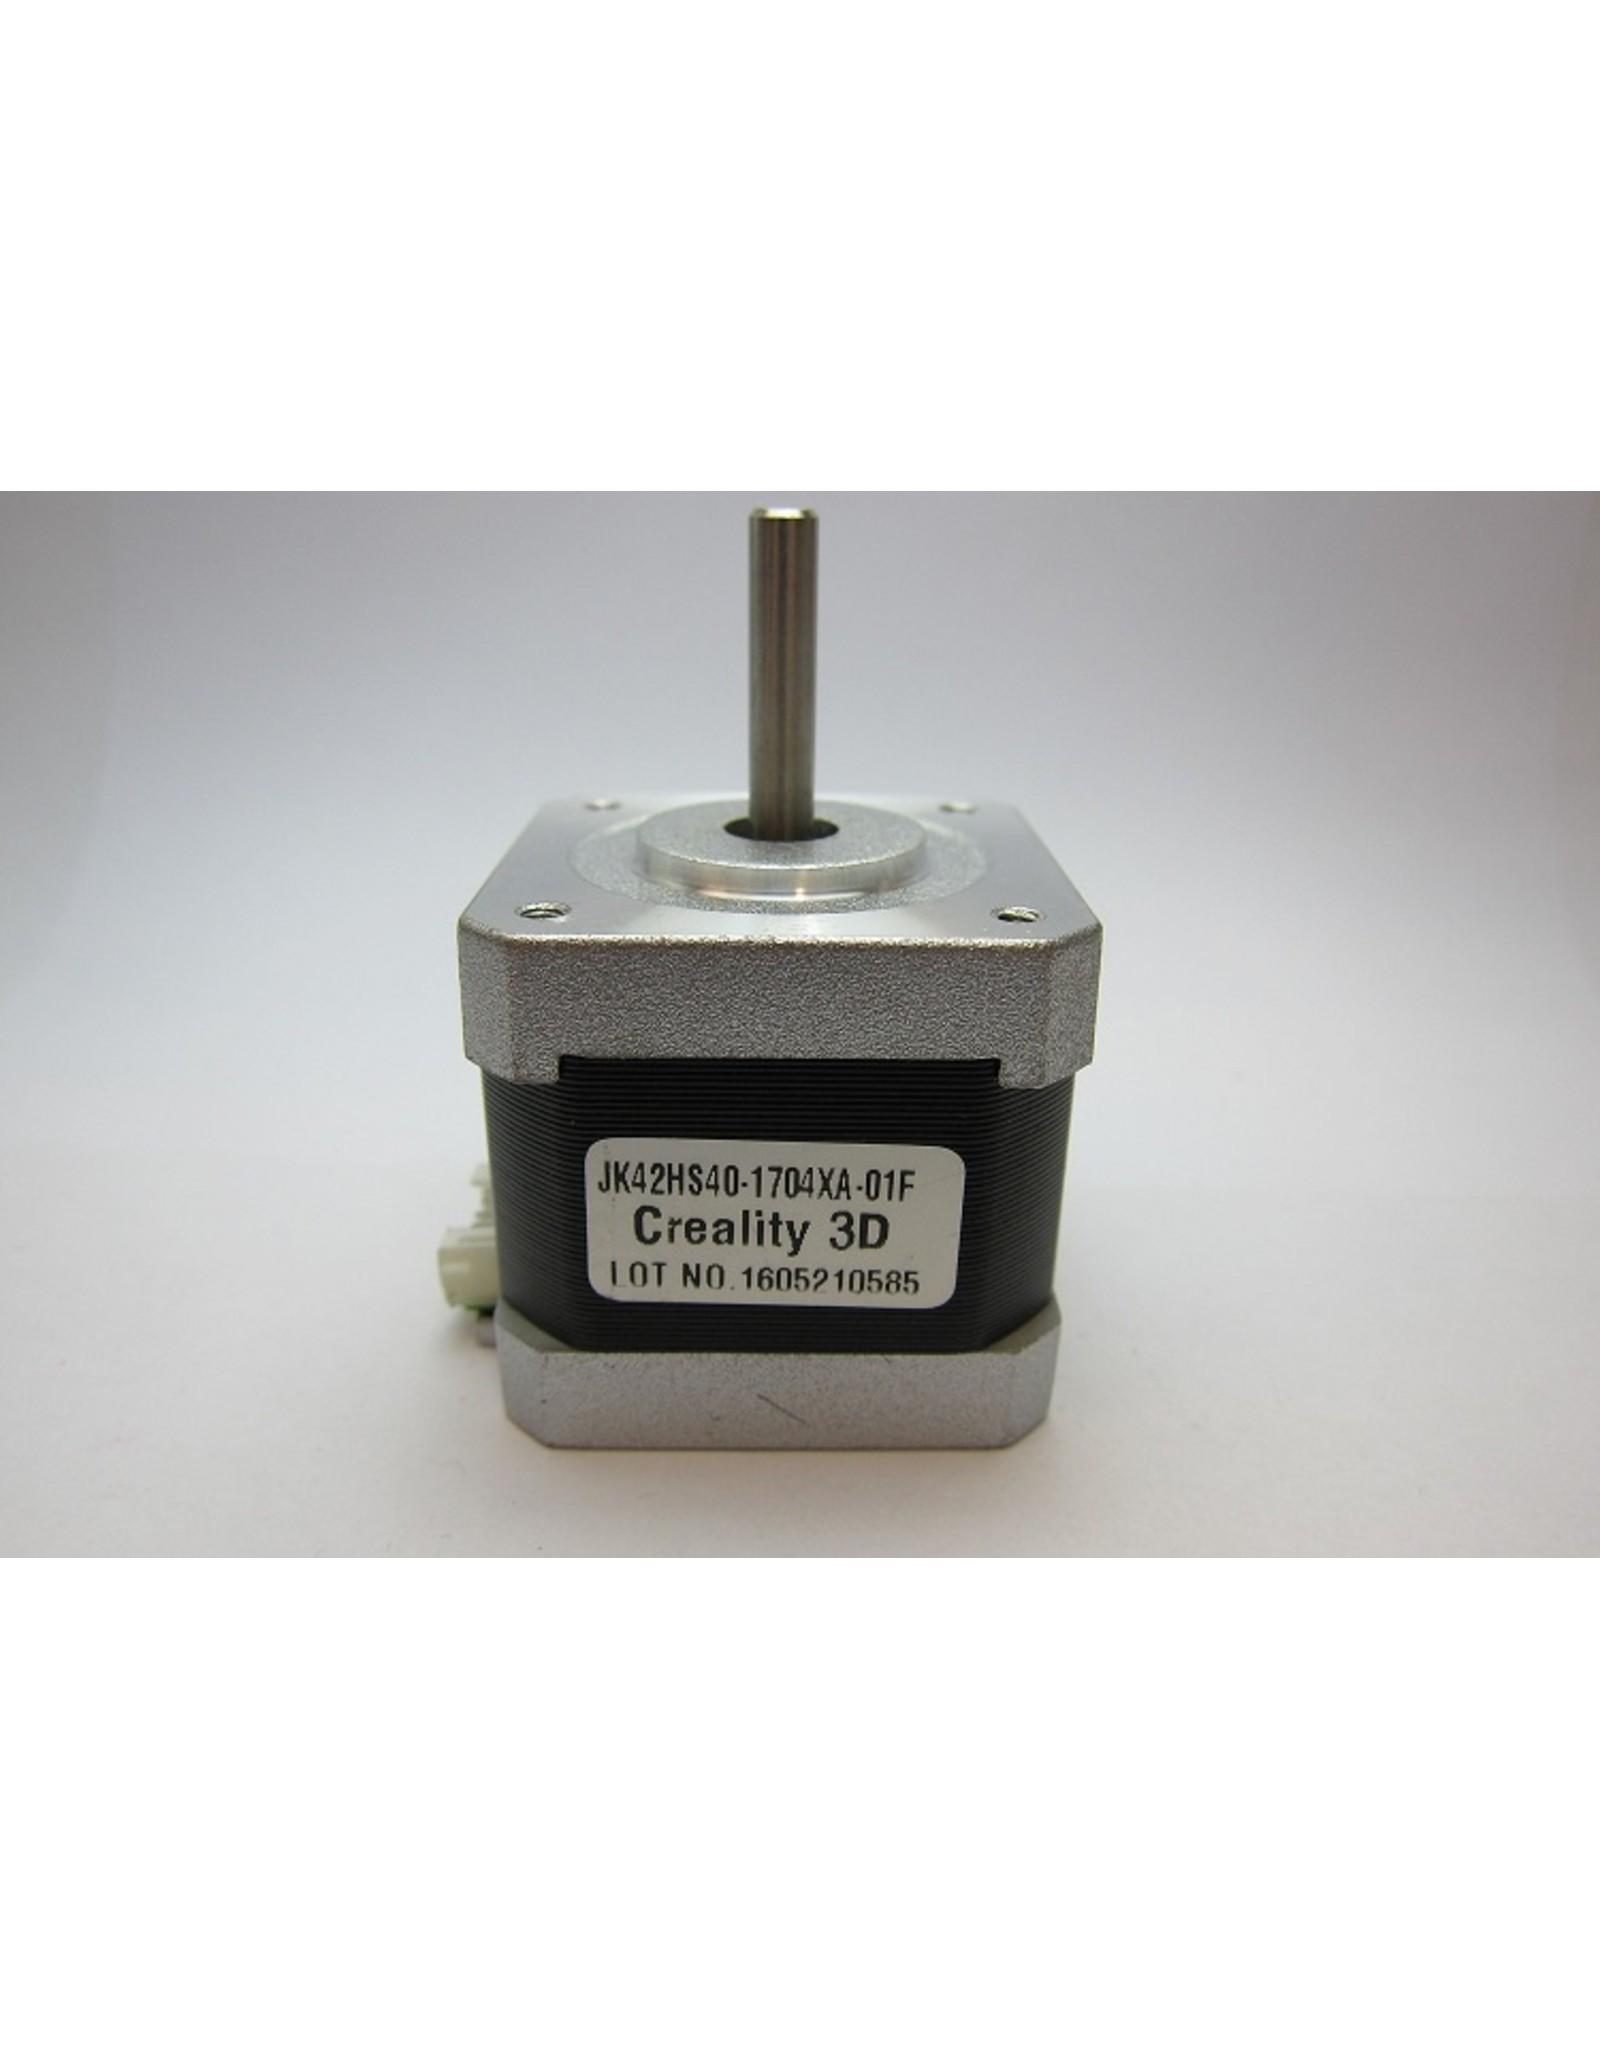 Creality/Ender Creality 3D 42-40 stappenmotor